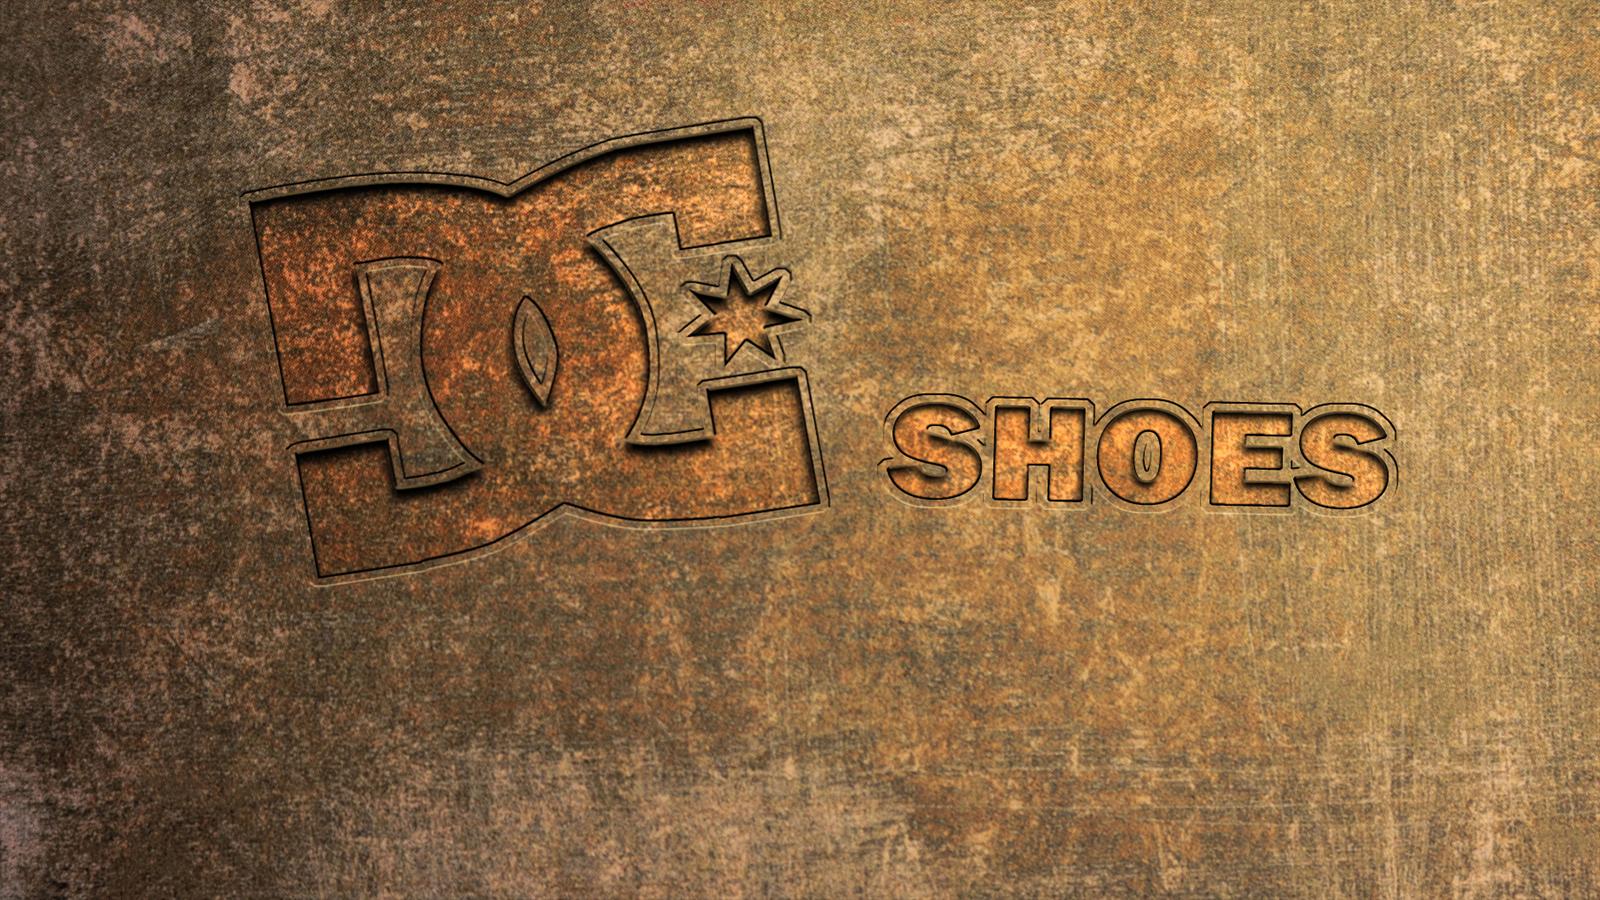 Dc Shoes Wallpaper